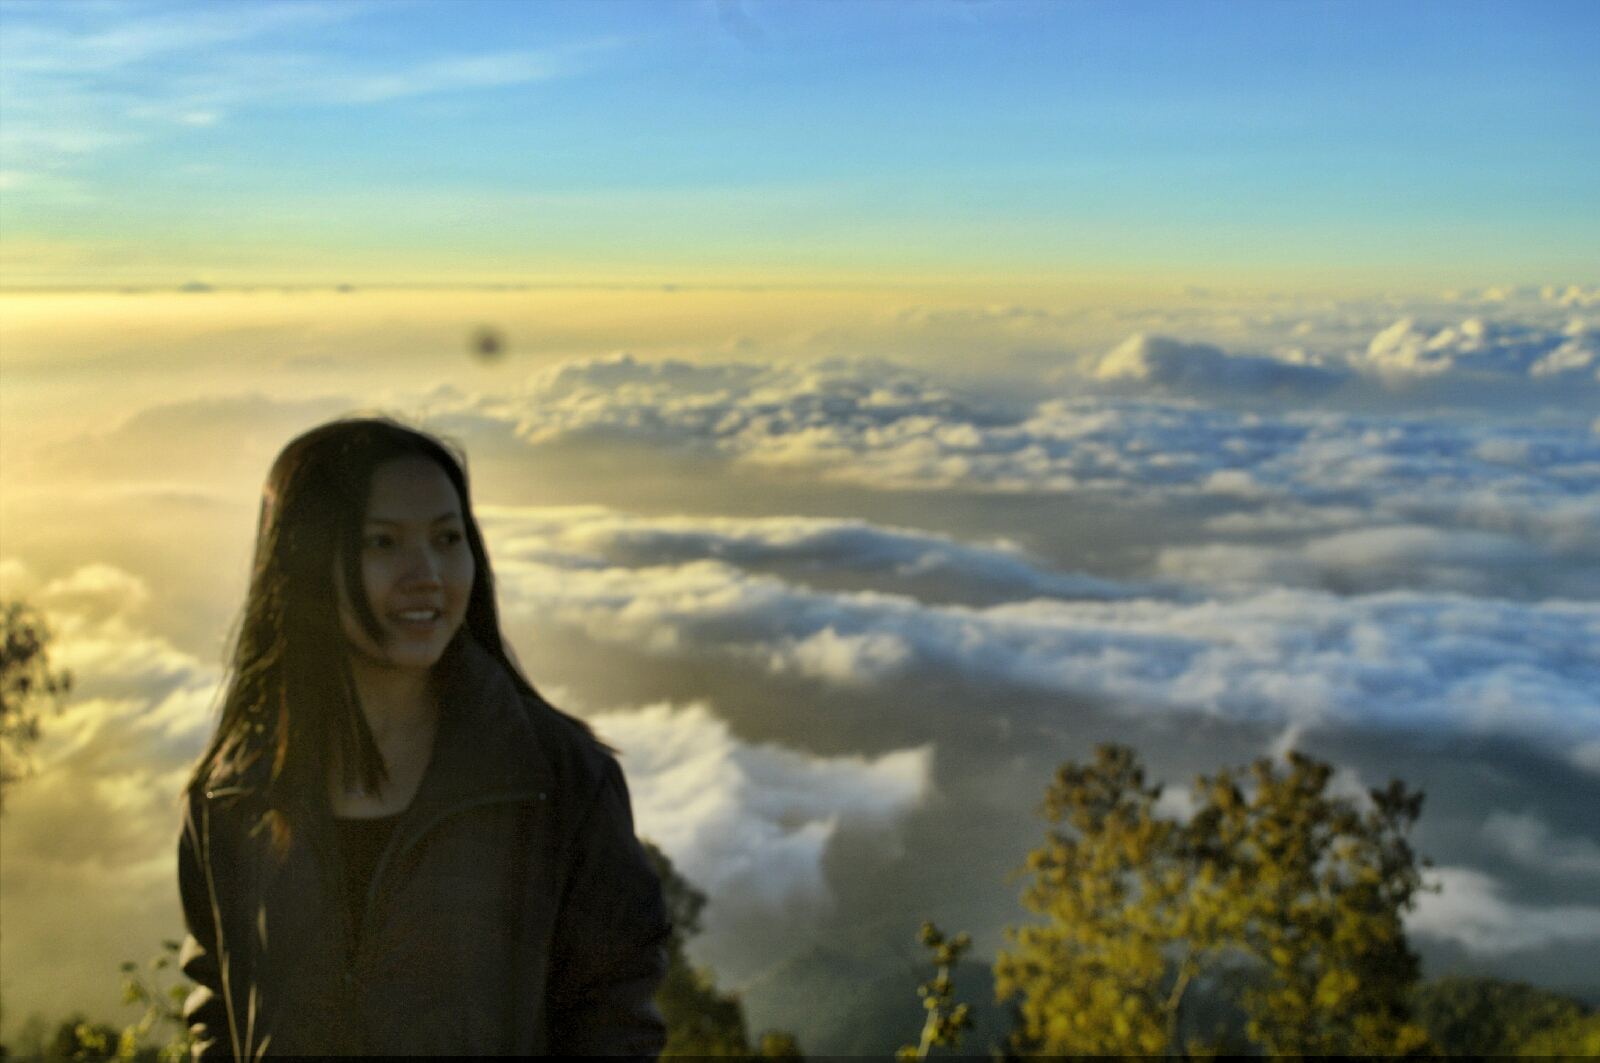 Tentang Hidup Destinasi Wisata Gunung Ranti Banyuwangi